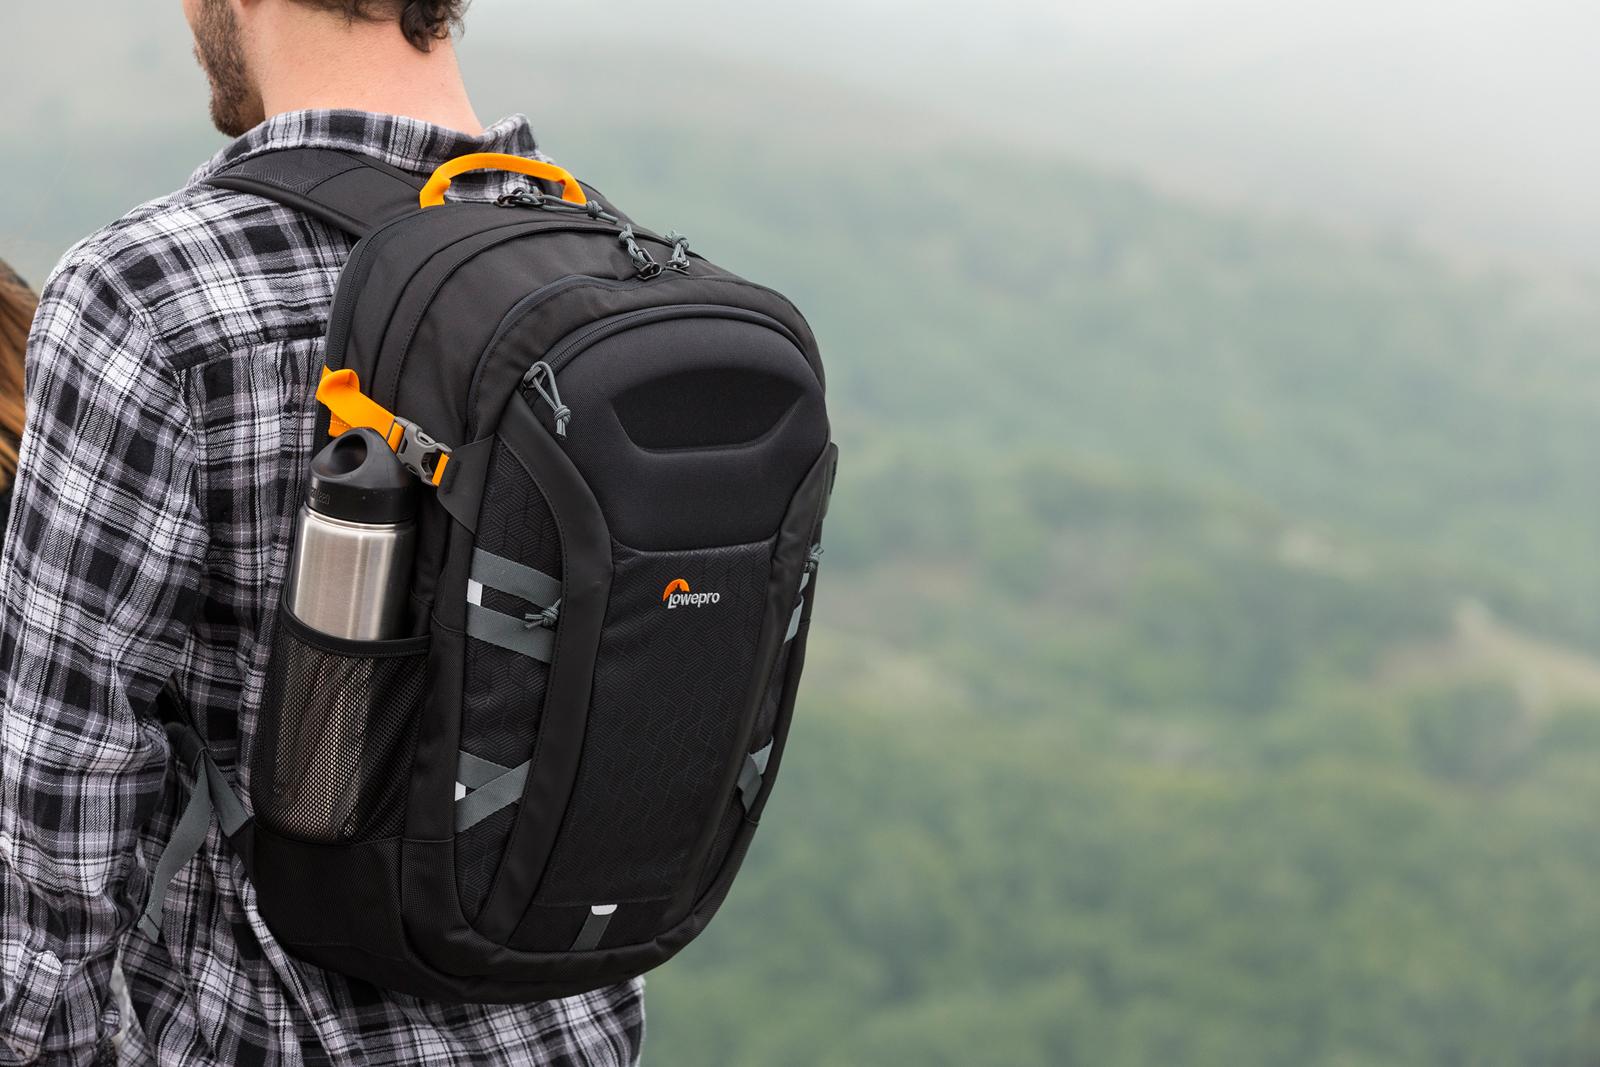 Free Bag Friday – RidgeLine Pro BP 300 AW